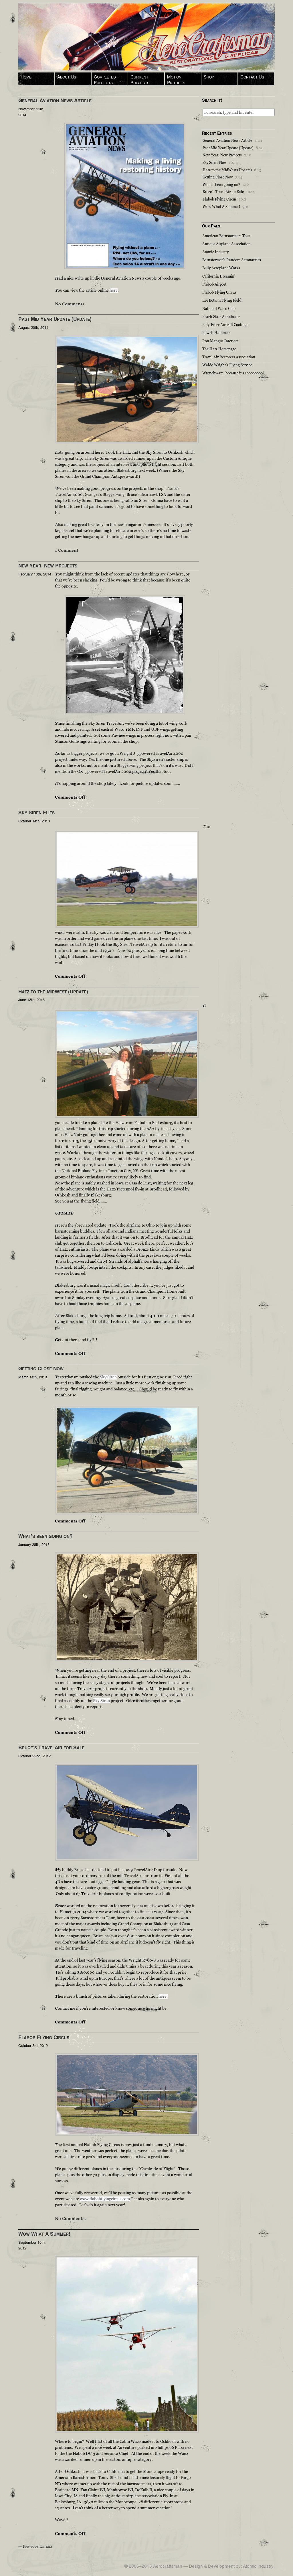 Aerocraftsman Competitors, Revenue and Employees - Owler